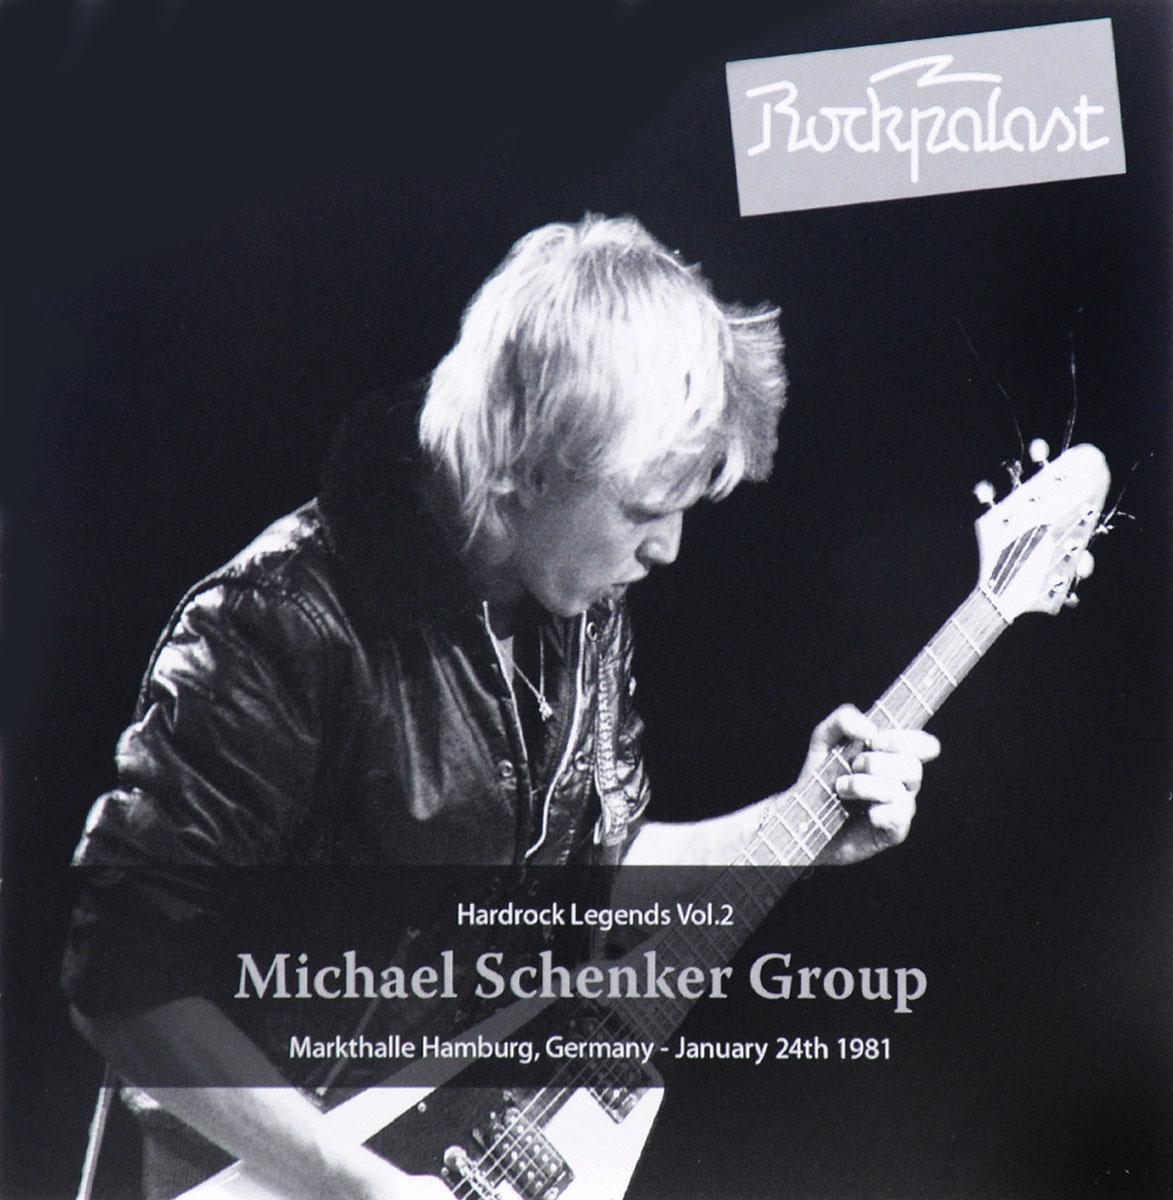 """The Michael Schenker Group"" Michael Schenker Group. Hardrock Legends. Vol. 2"